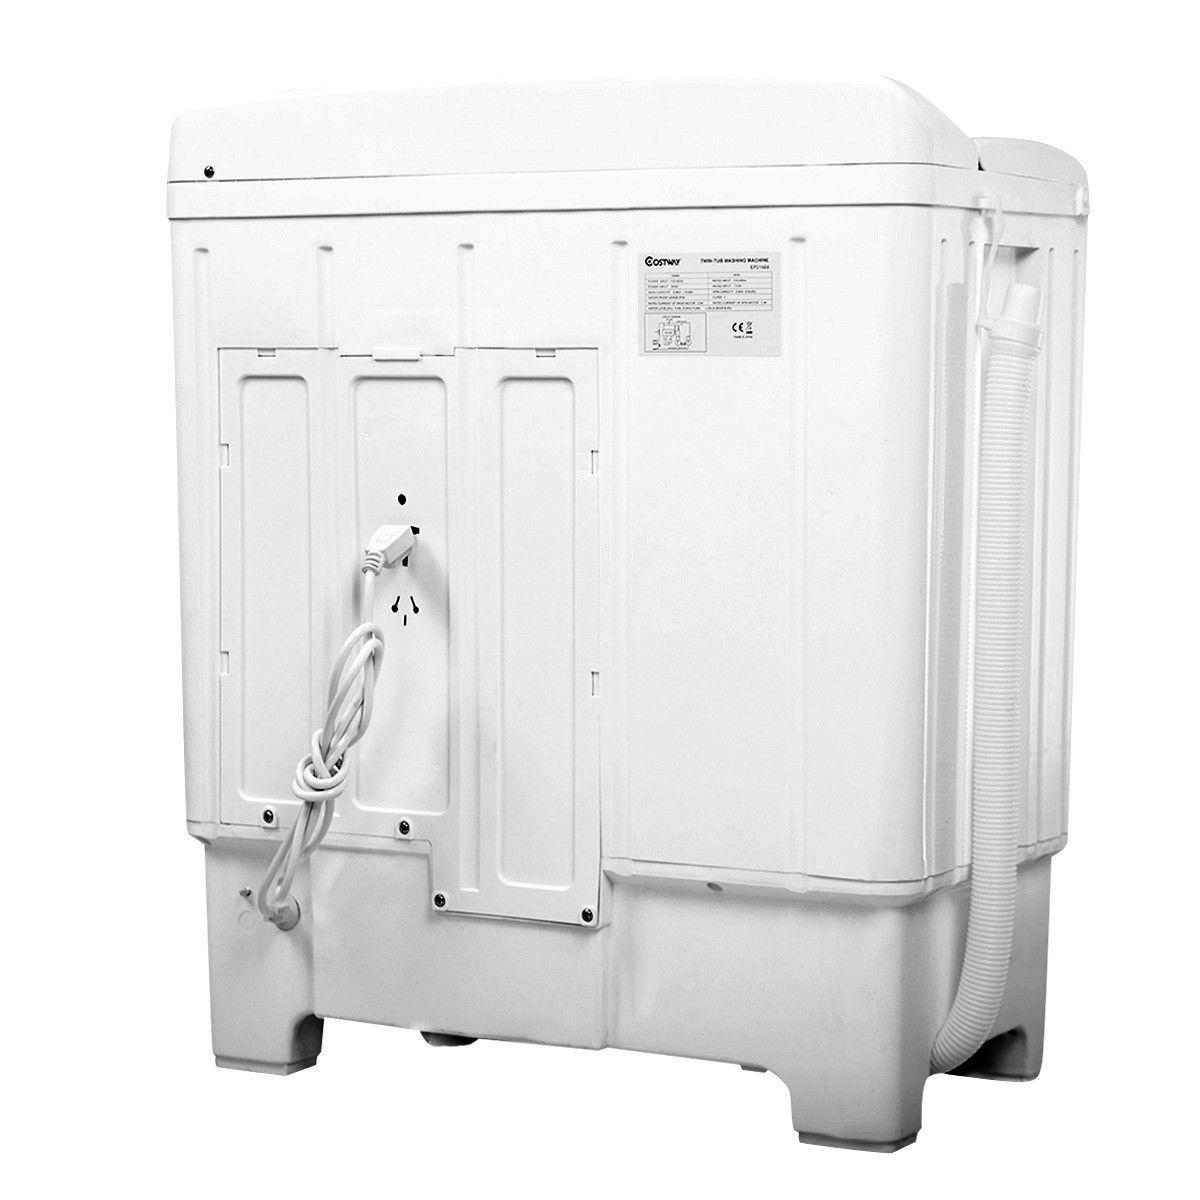 11 lbs Compact Twin Tub Washing Machine Washer Spinner